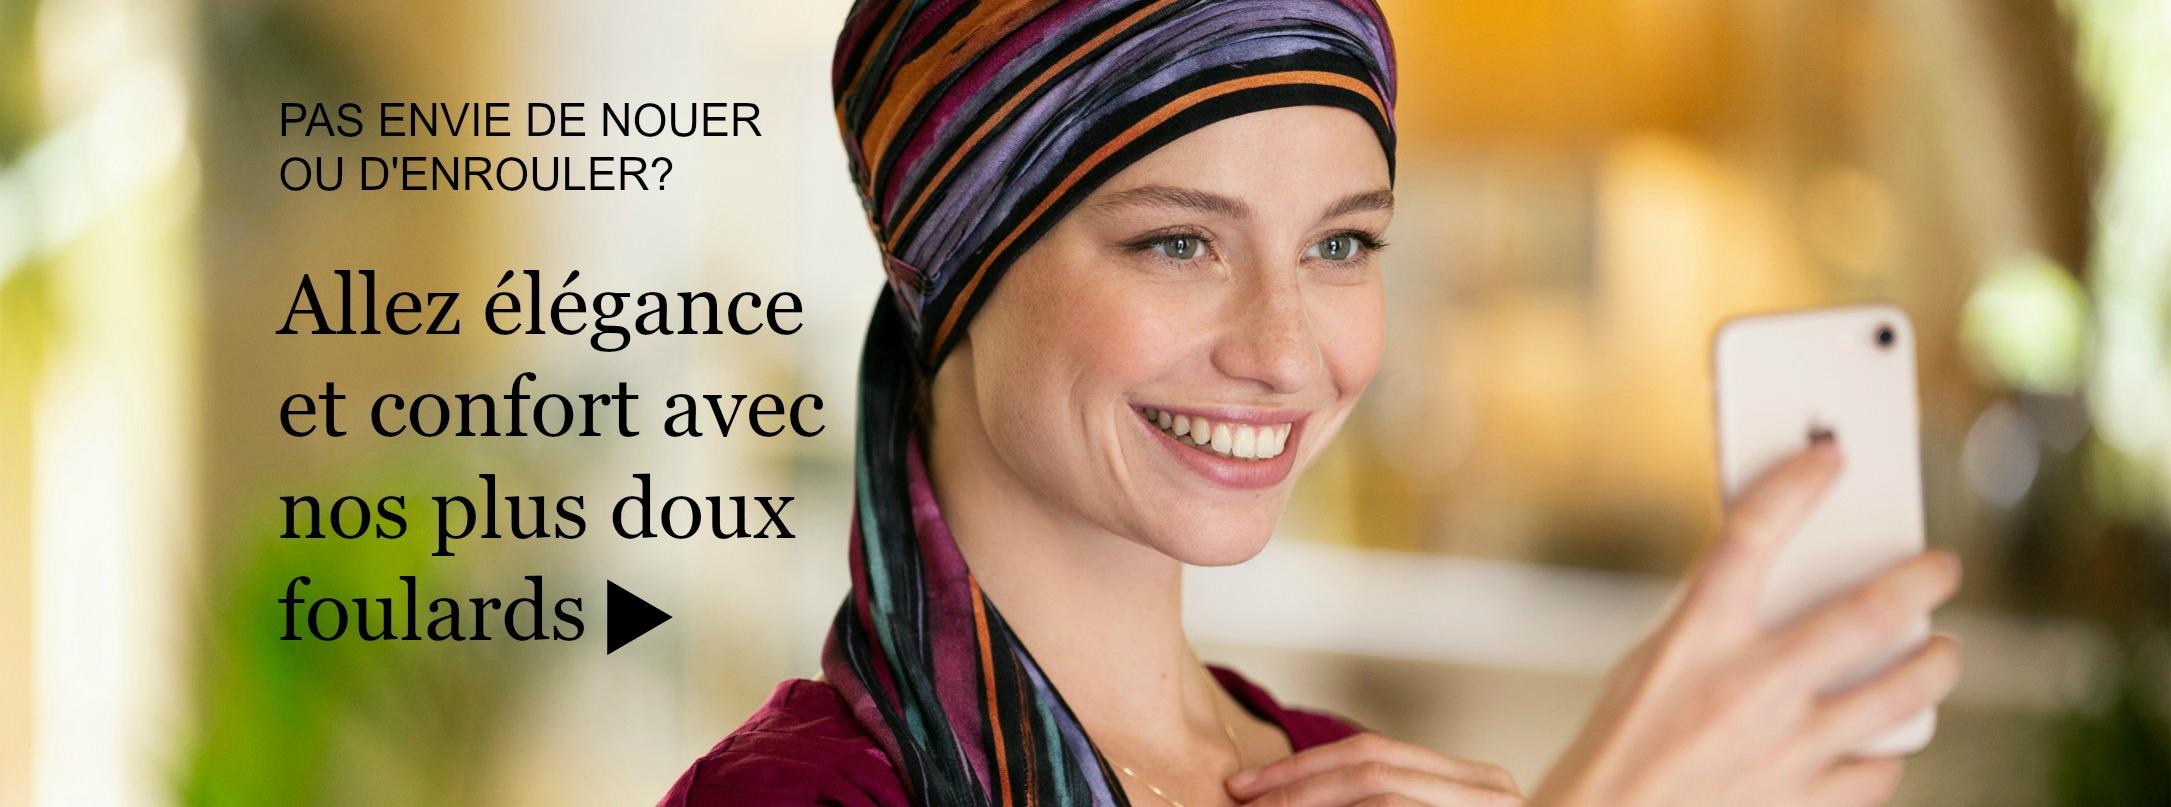 foulards chimio faciles à mettre